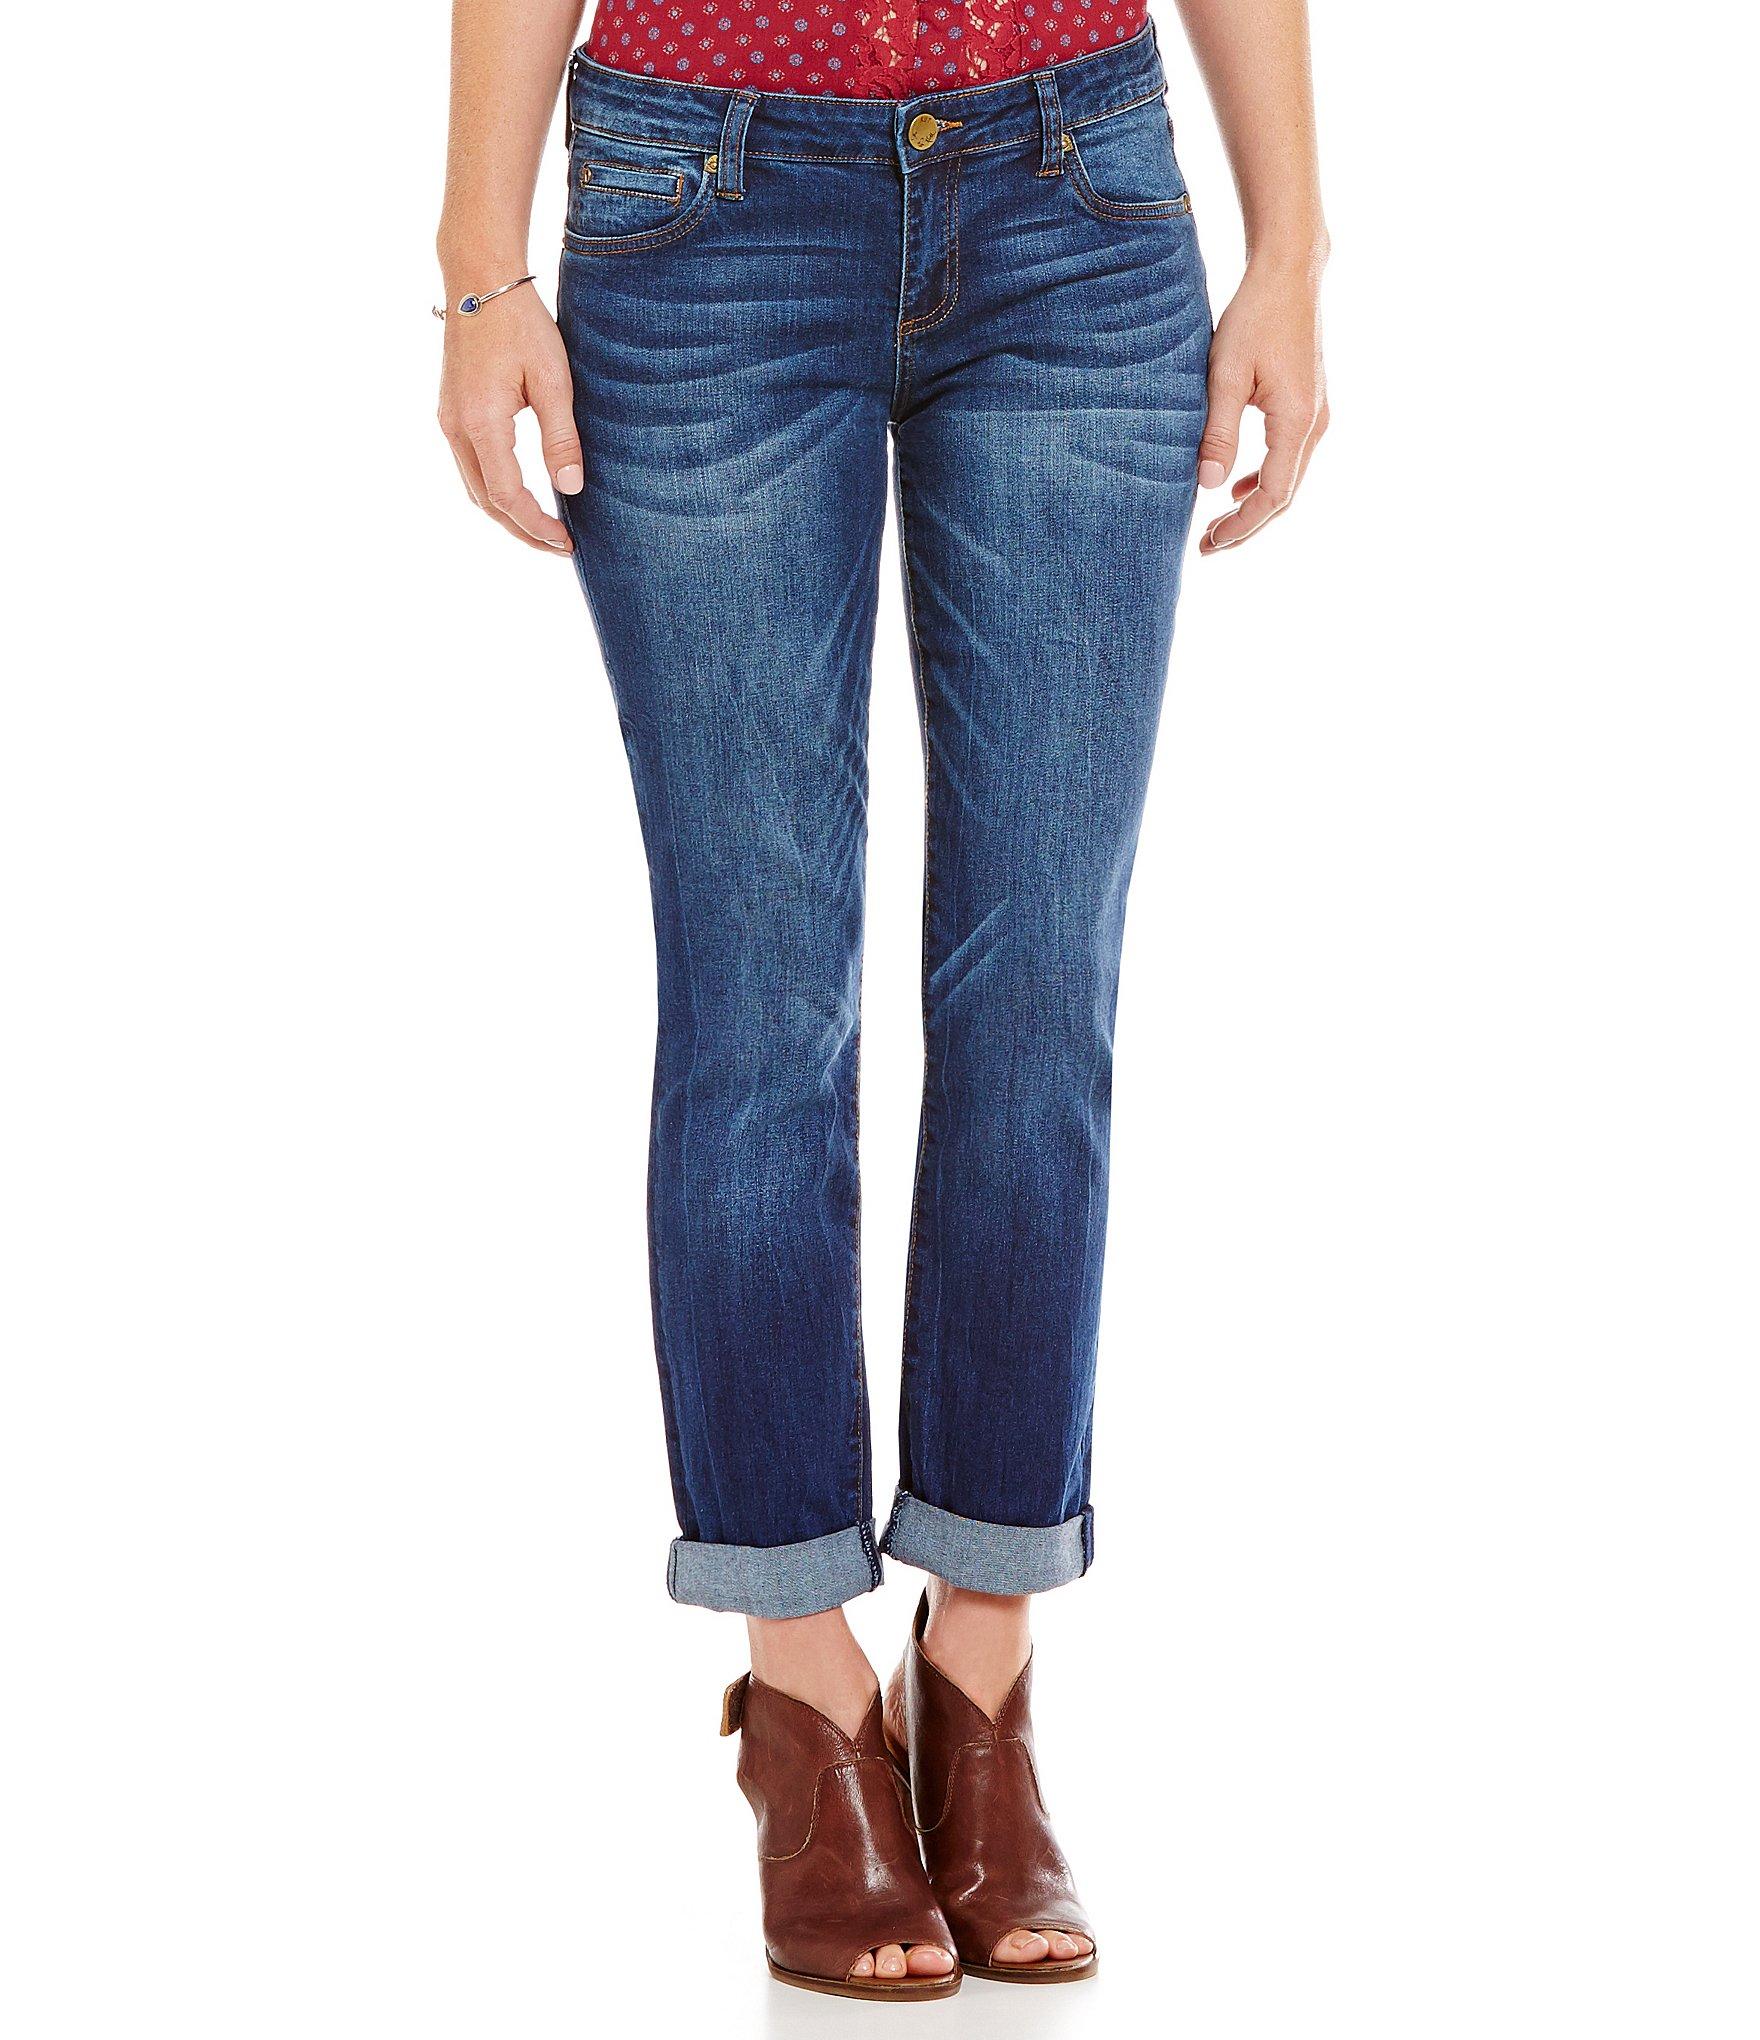 kut from the kloth catherine boyfriend jeans dillards. Black Bedroom Furniture Sets. Home Design Ideas